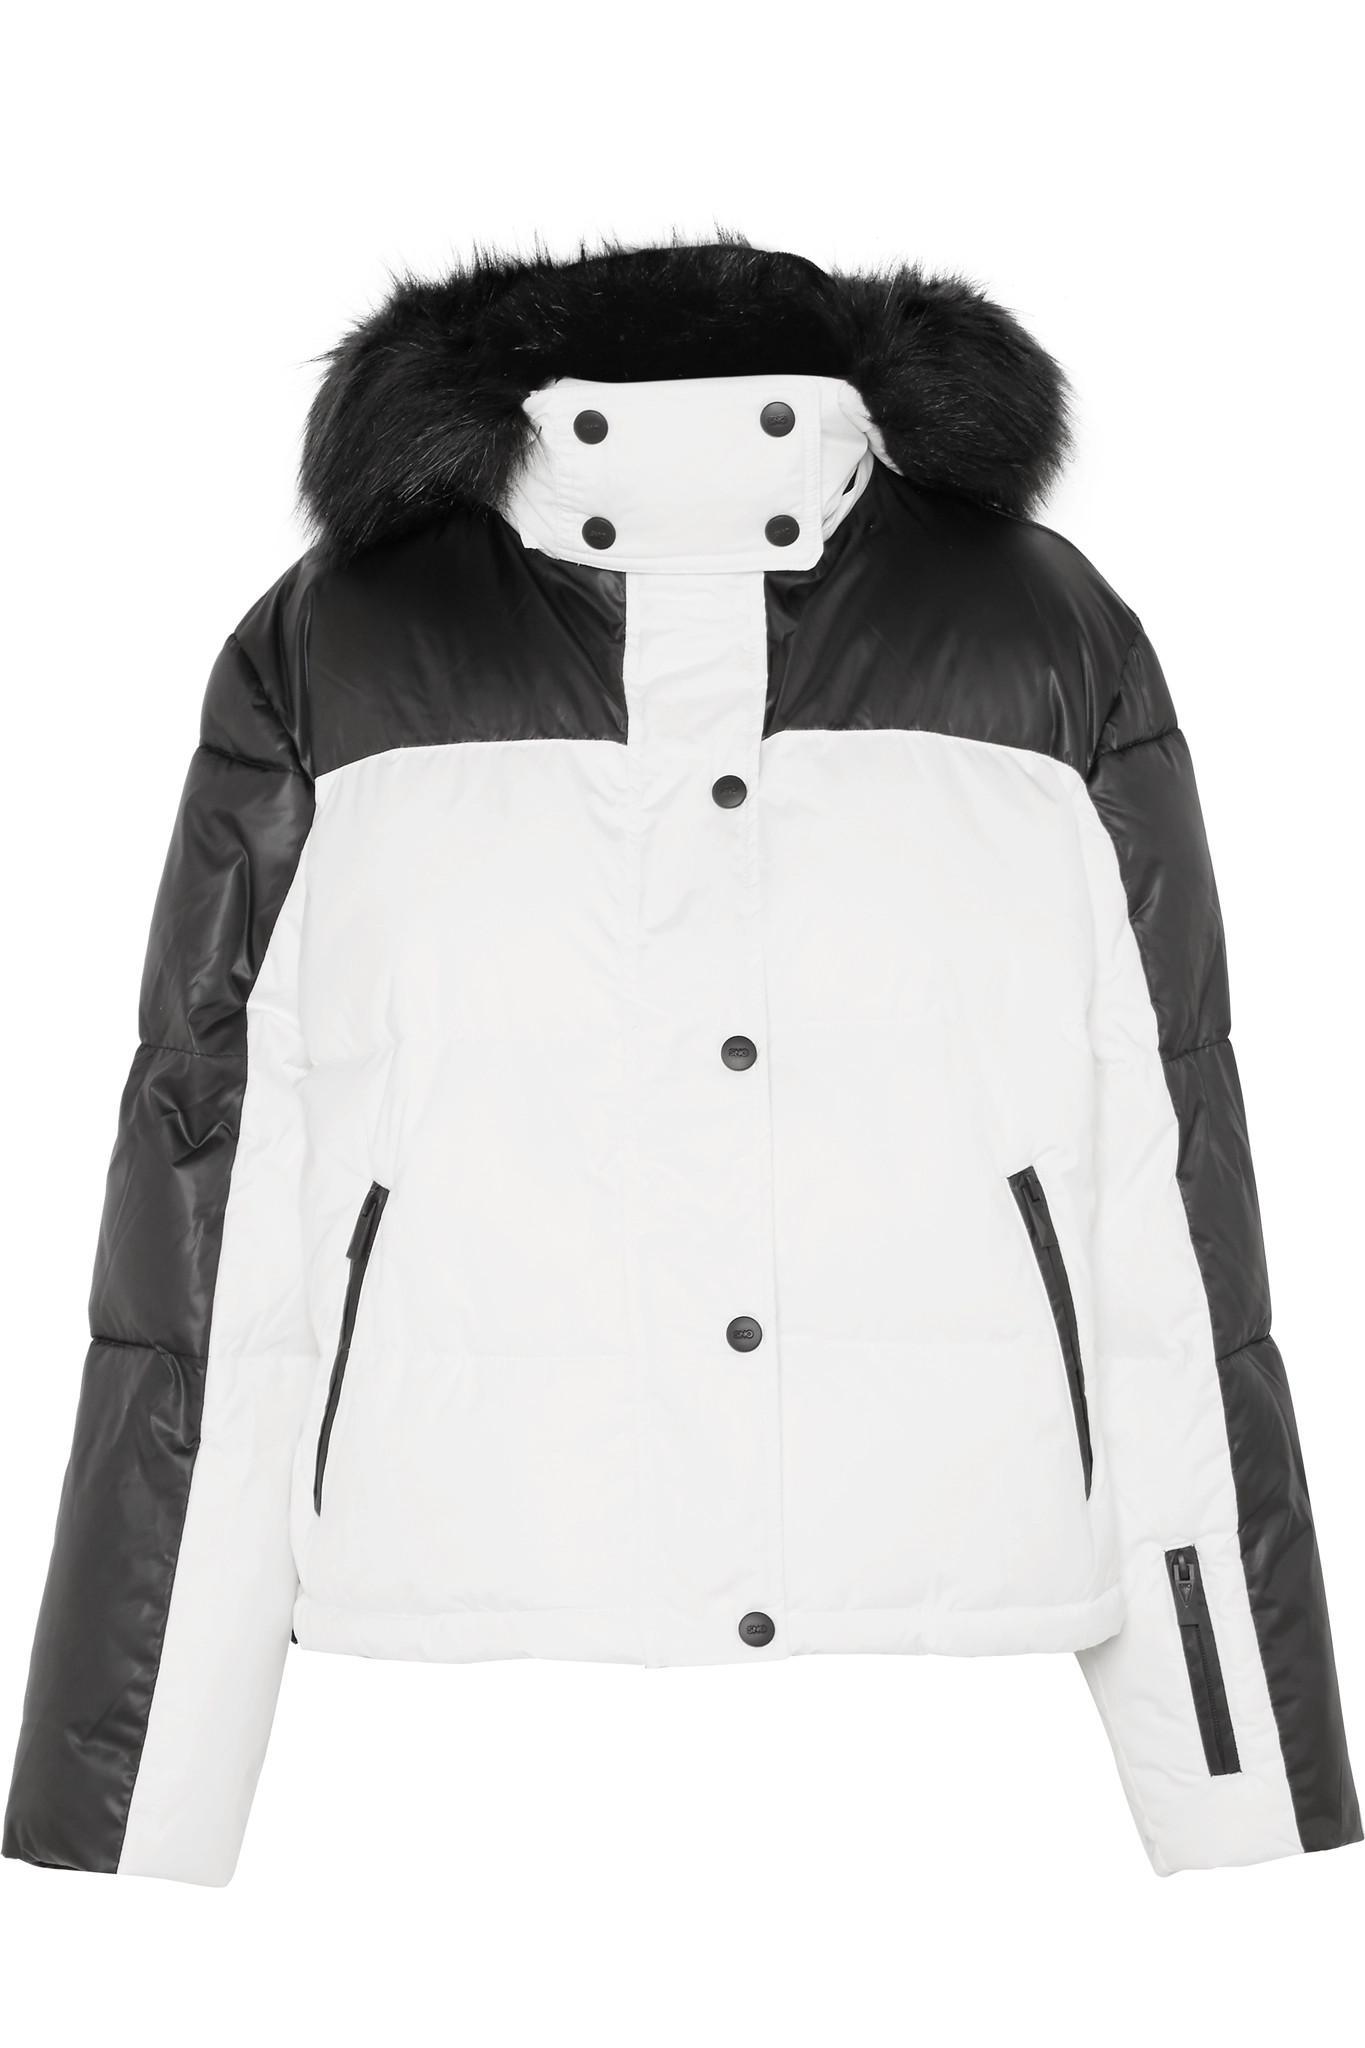 9fce24d372bf TOPSHOP Siren Hooded Faux Fur-trimmed Ski Jacket in Black - Lyst